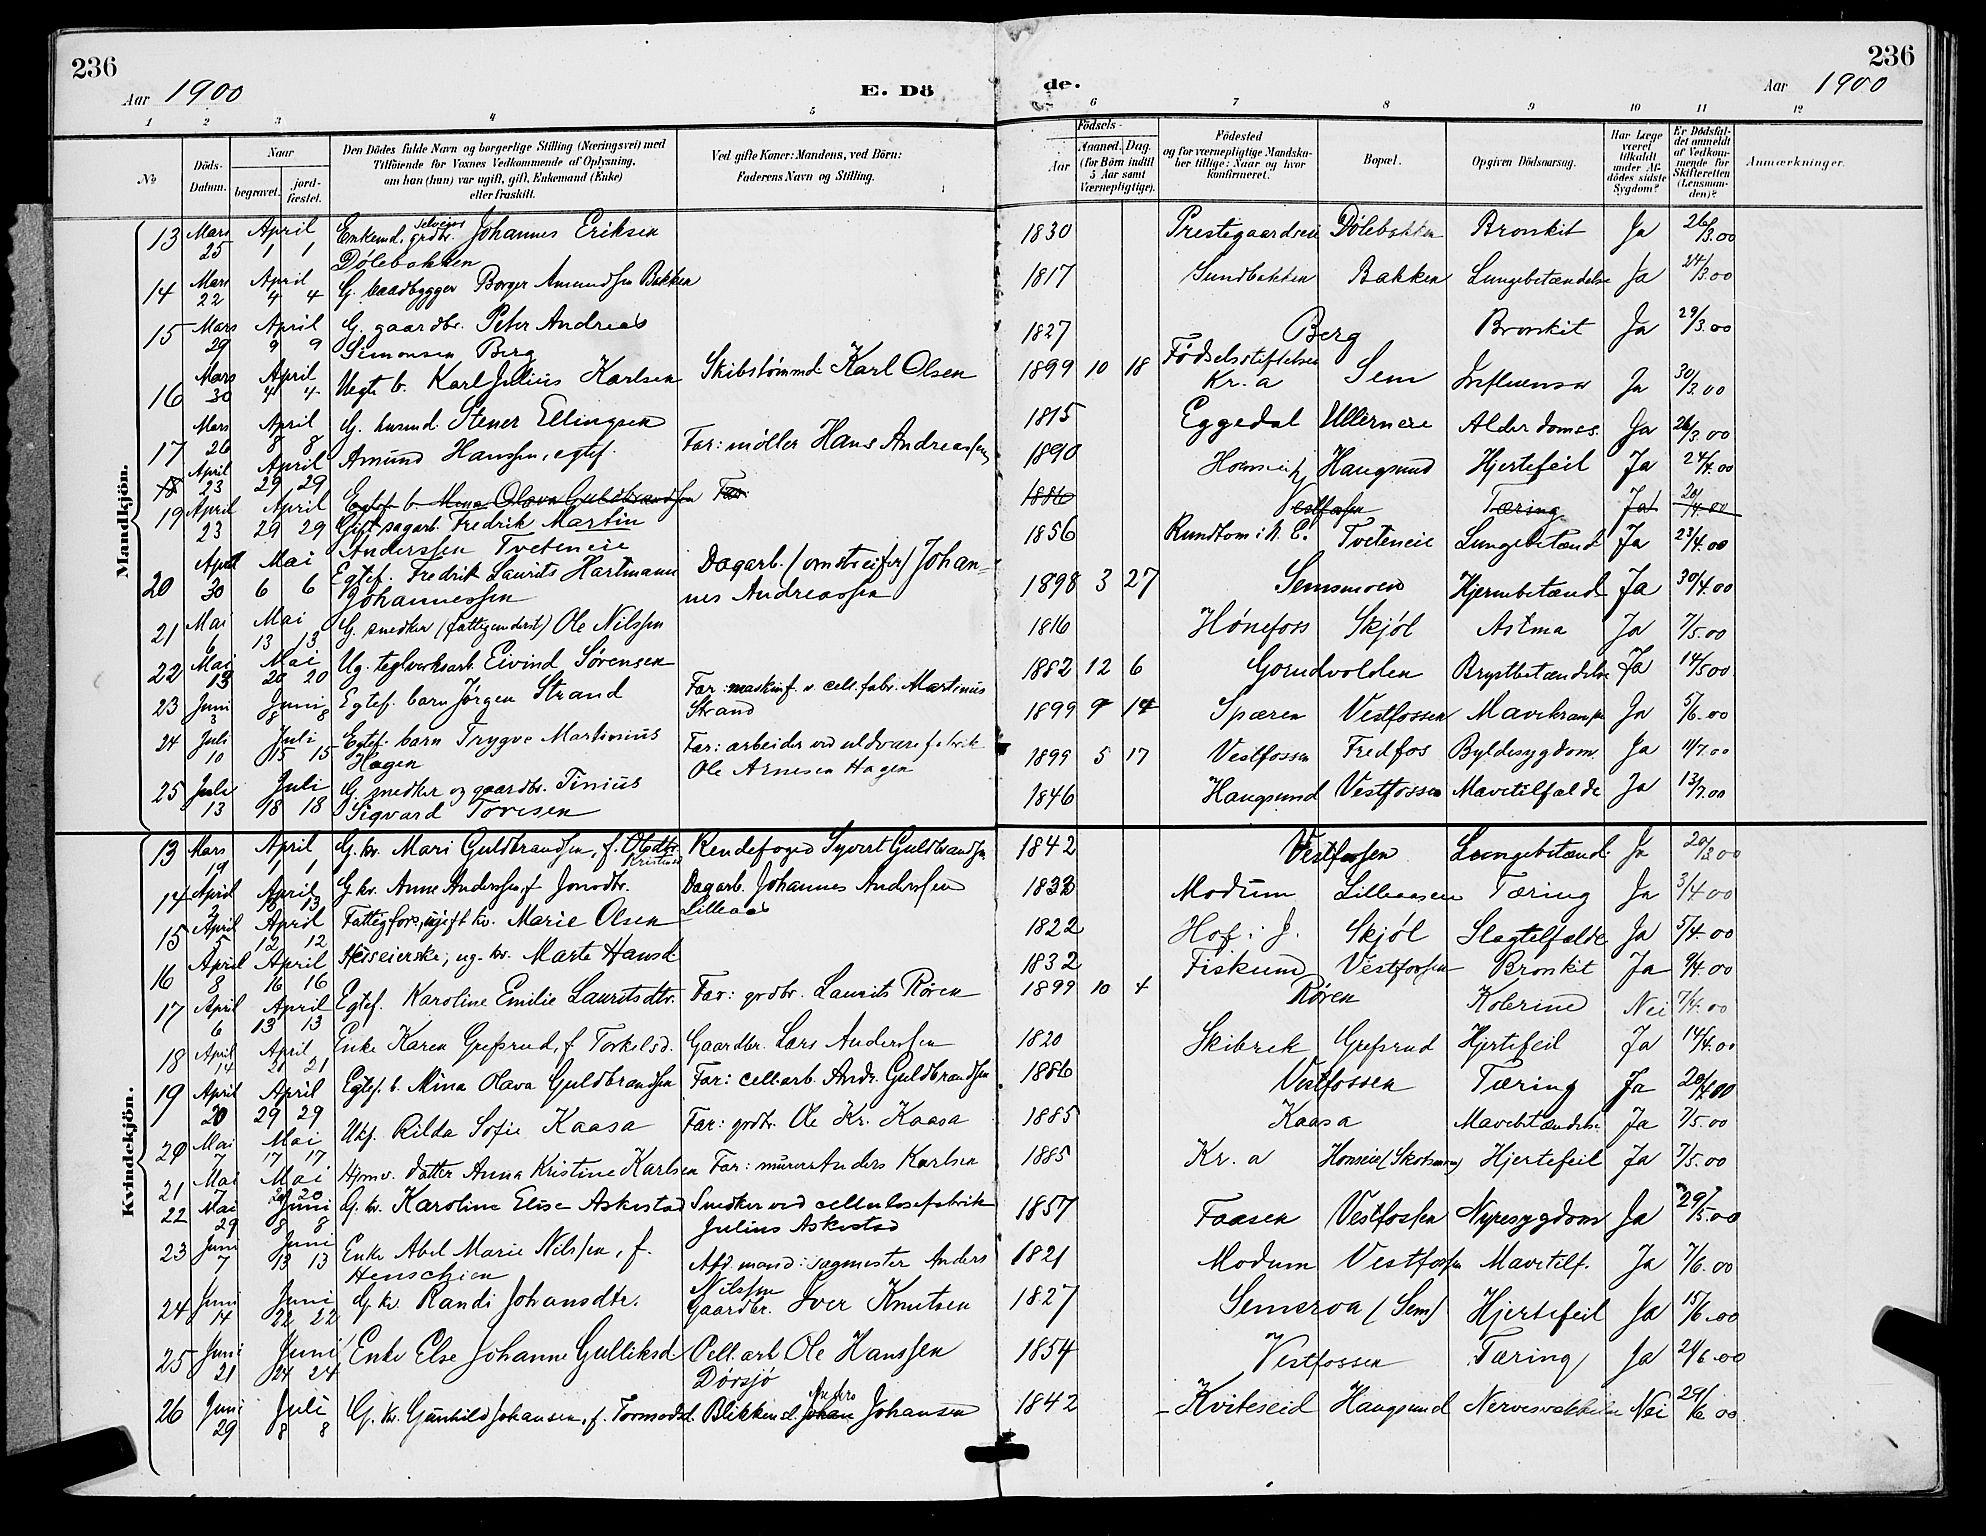 SAKO, Eiker kirkebøker, G/Ga/L0007: Parish register (copy) no. I 7, 1893-1902, p. 236